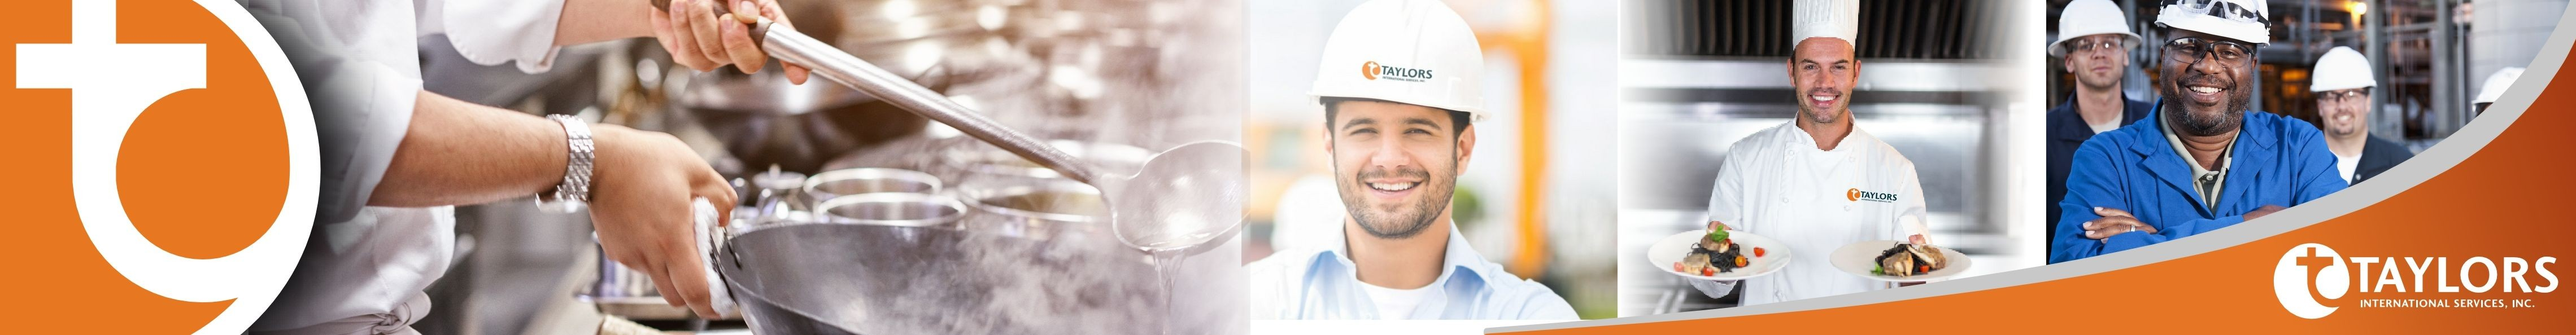 Taylors International Services, Inc  | LinkedIn